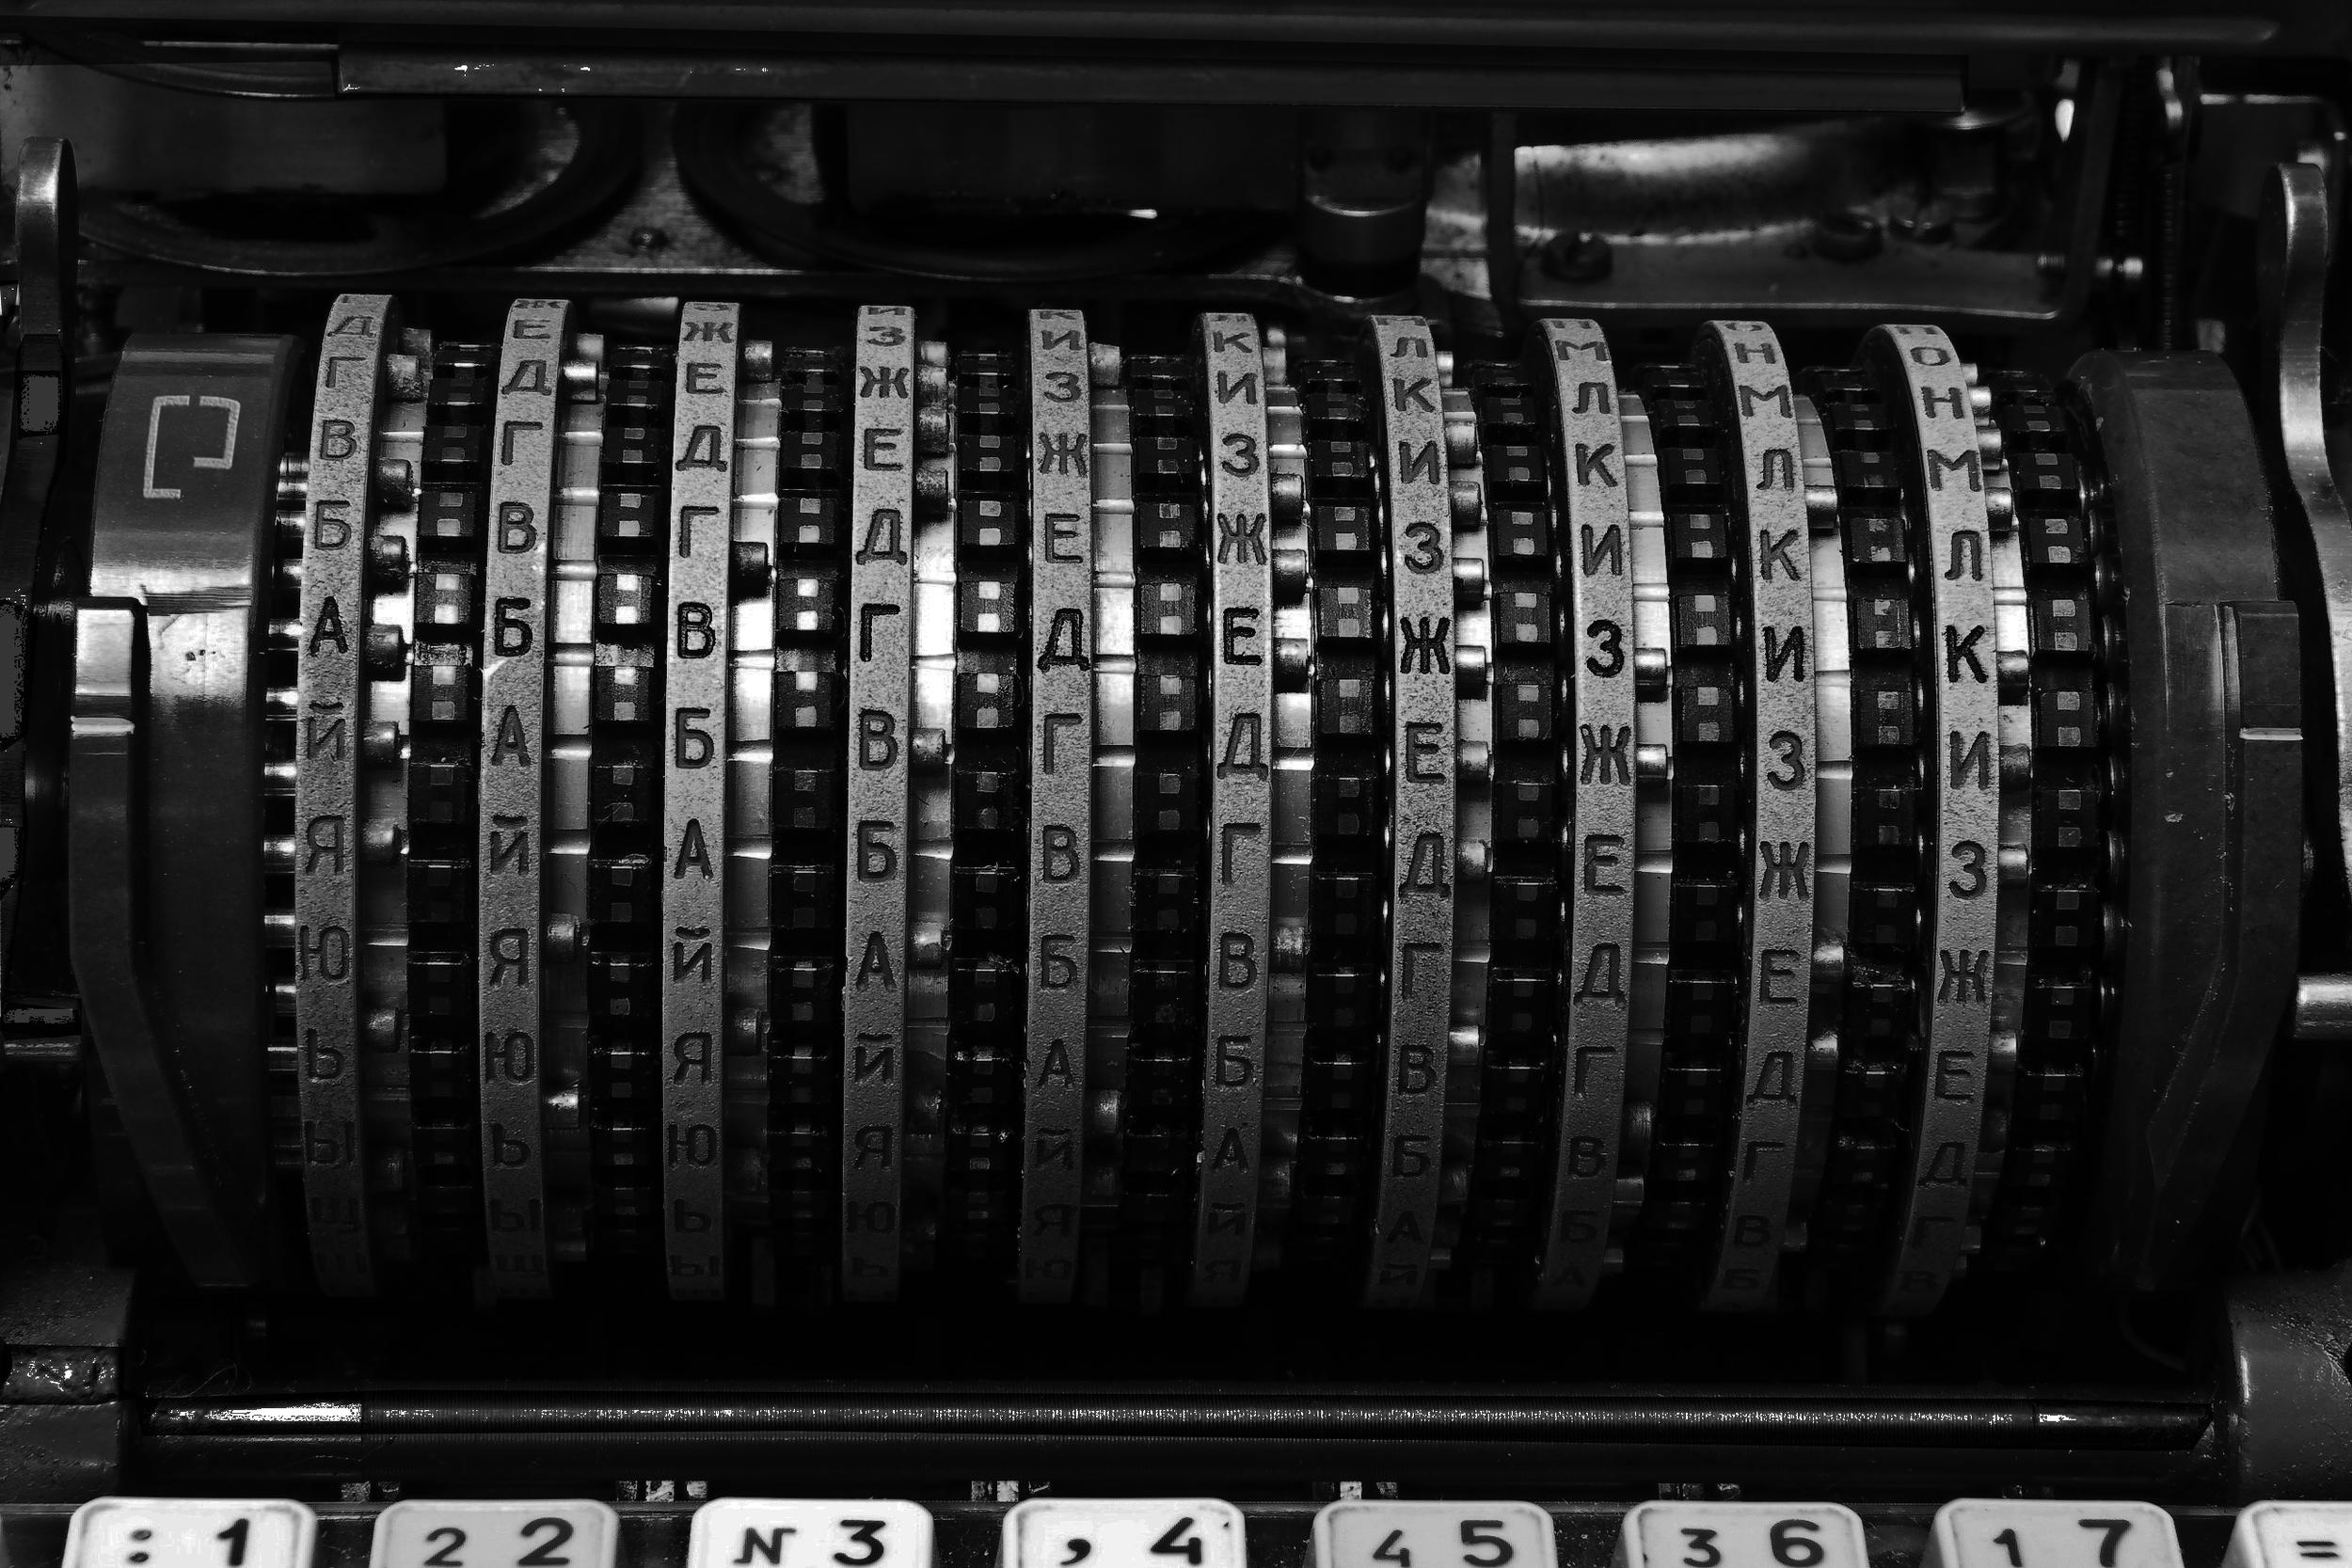 fialka_rotor_stack.jpg